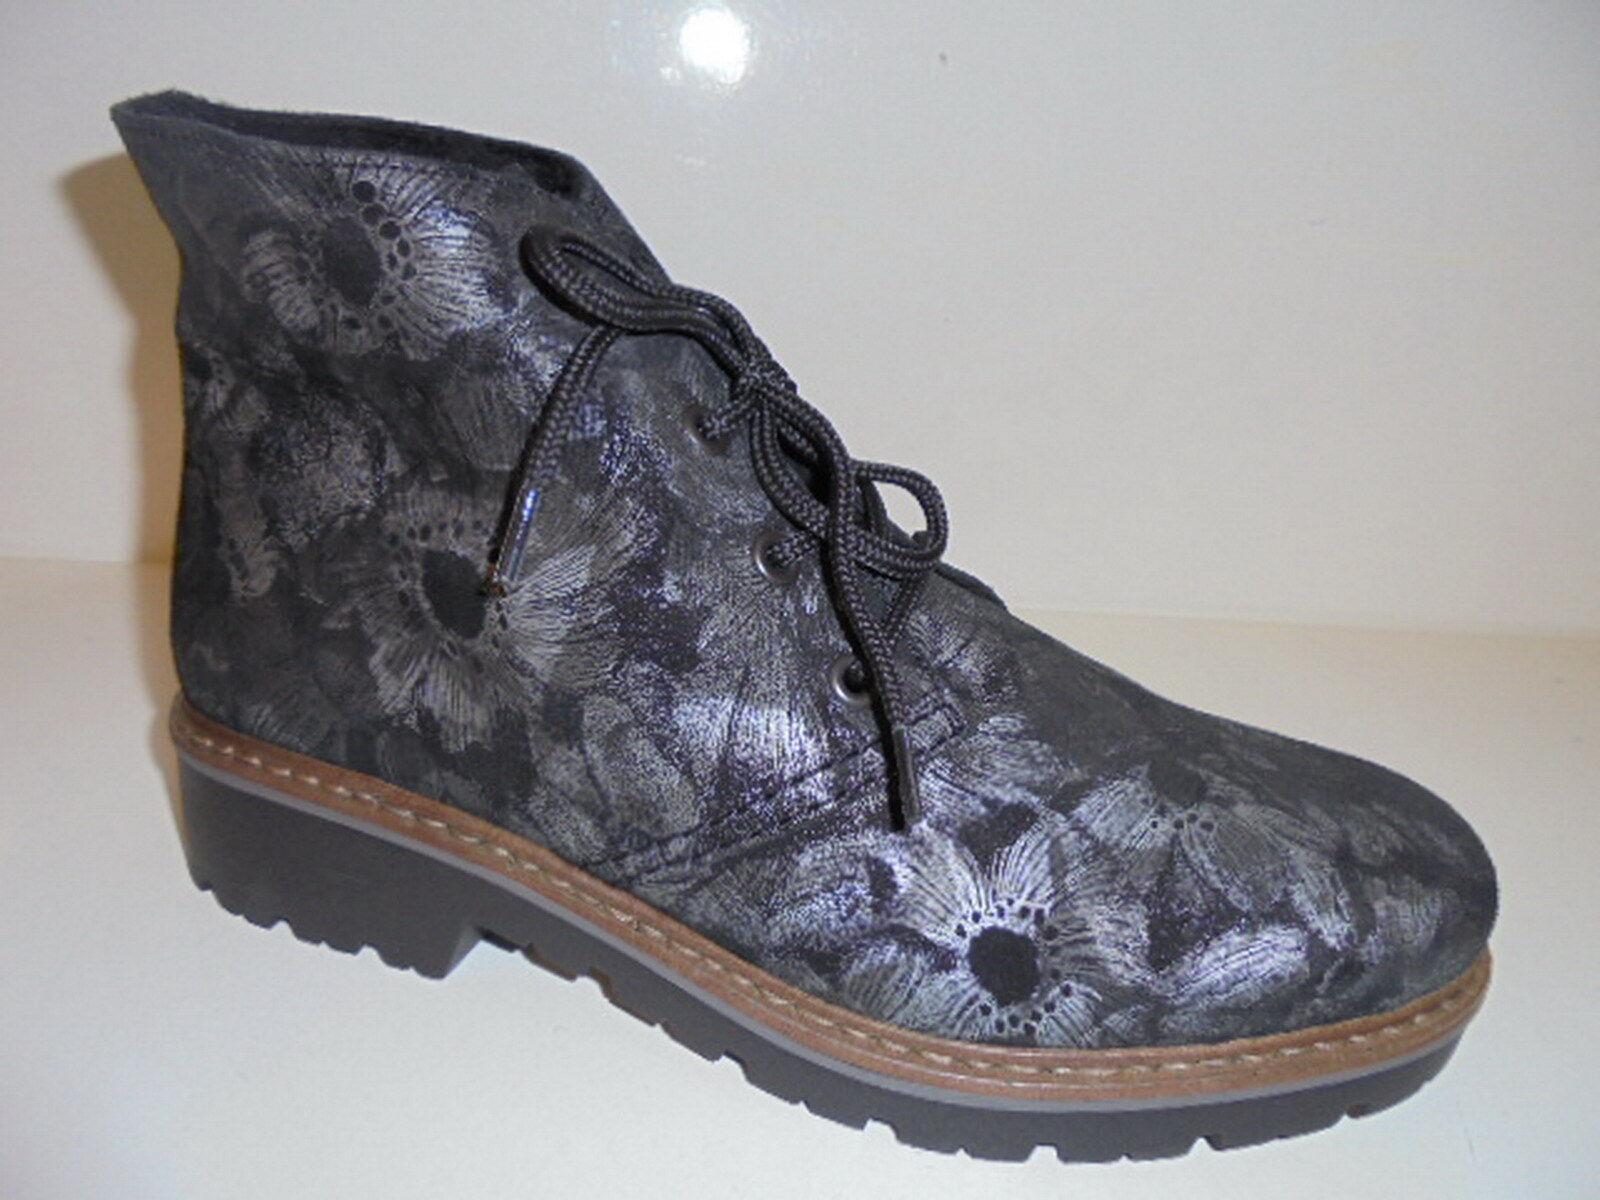 Z4542 RIEKER Damenschuhe Stiefelette Echtleder Stiefel schwarz-grau Gr. 37